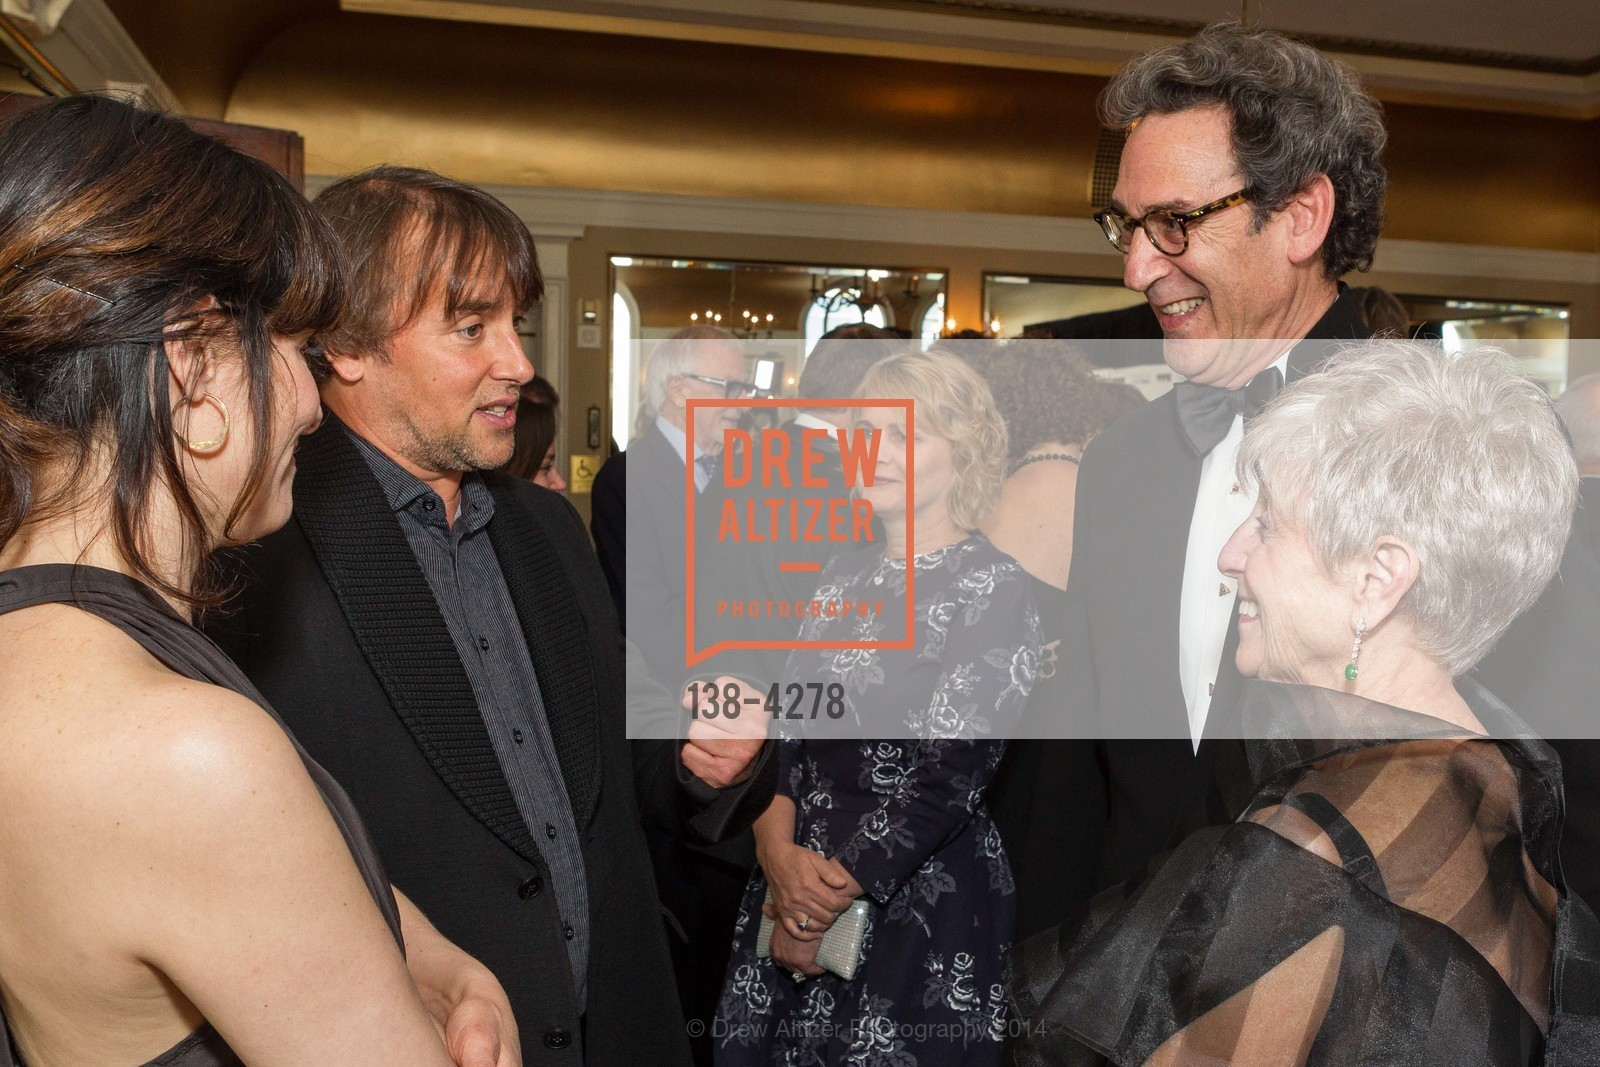 Parker Posey, Richard Linklater, Nancy Livinigston, Fred Levin, Photo #138-4278